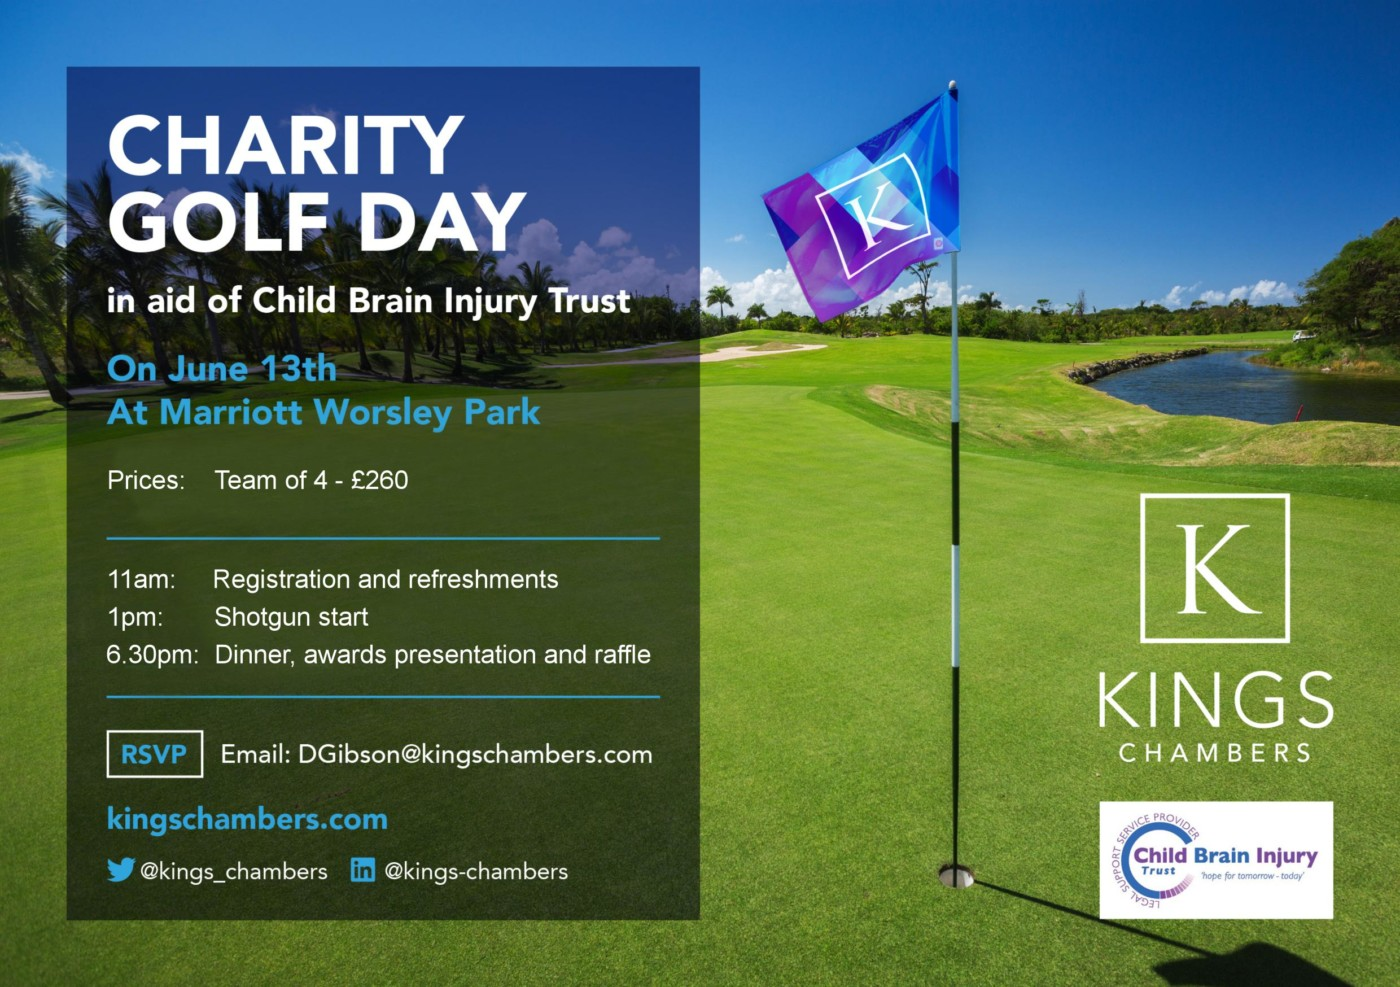 kings chambers golf event